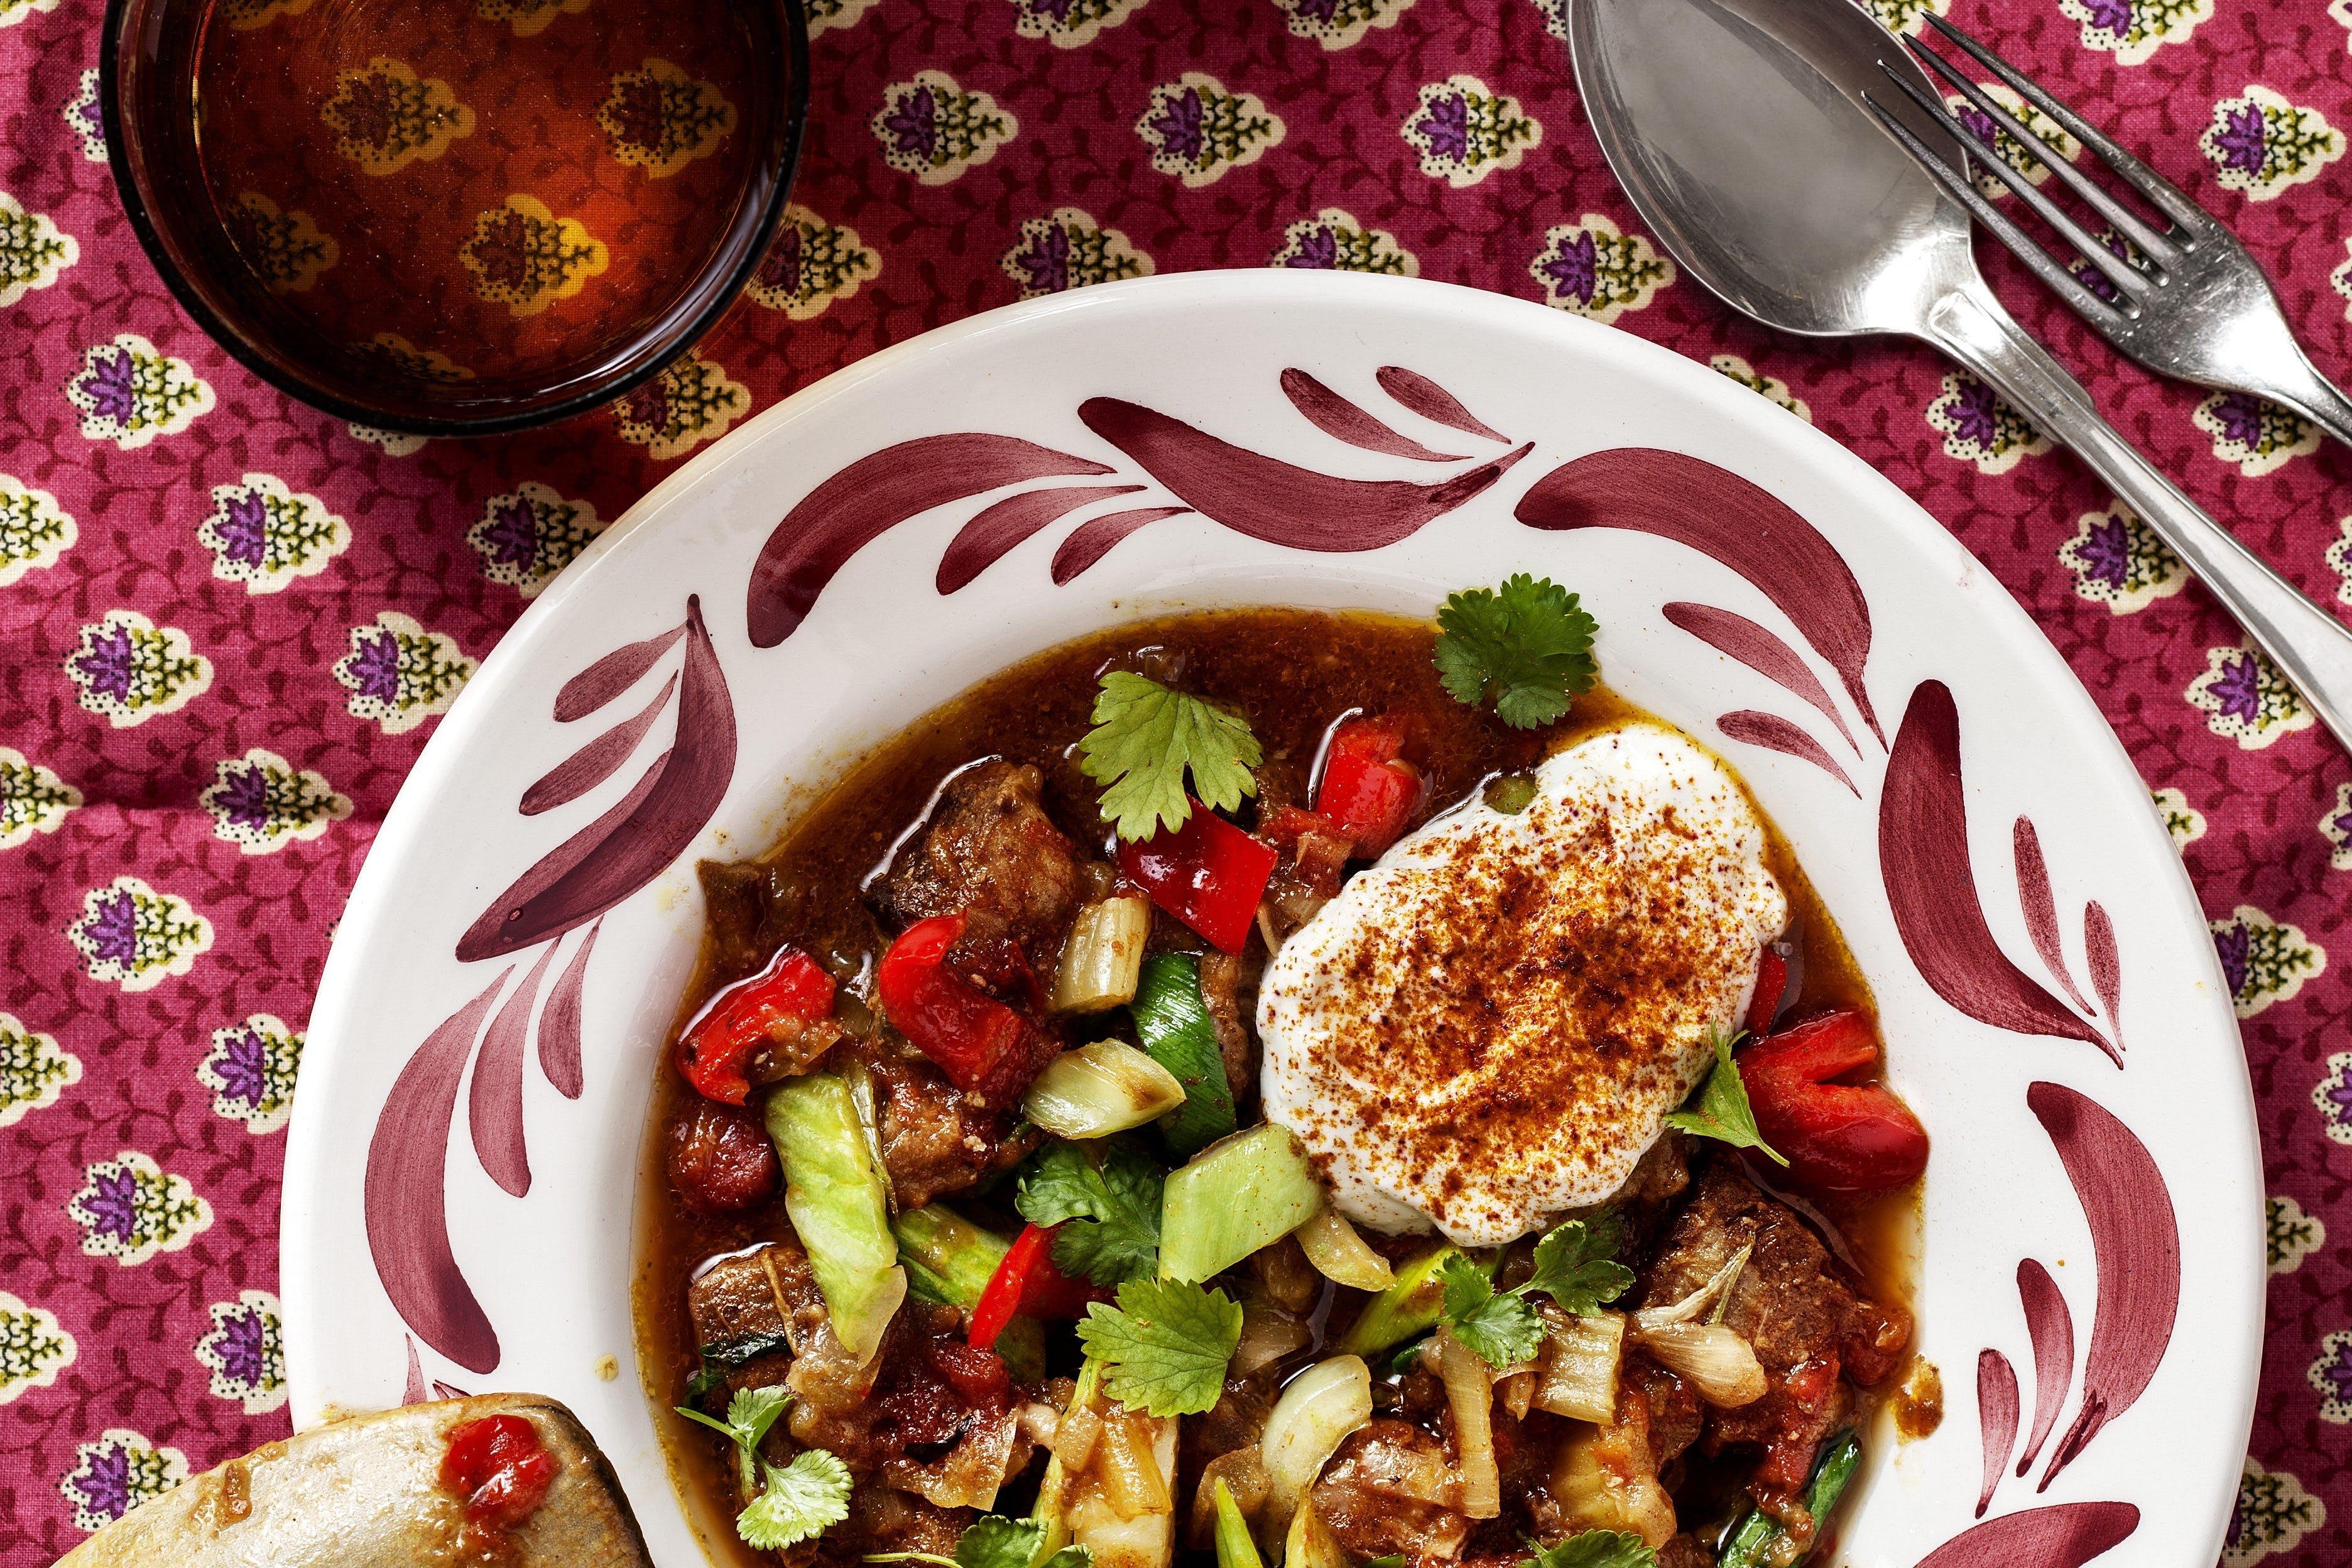 Low-carb Indian lamb stew